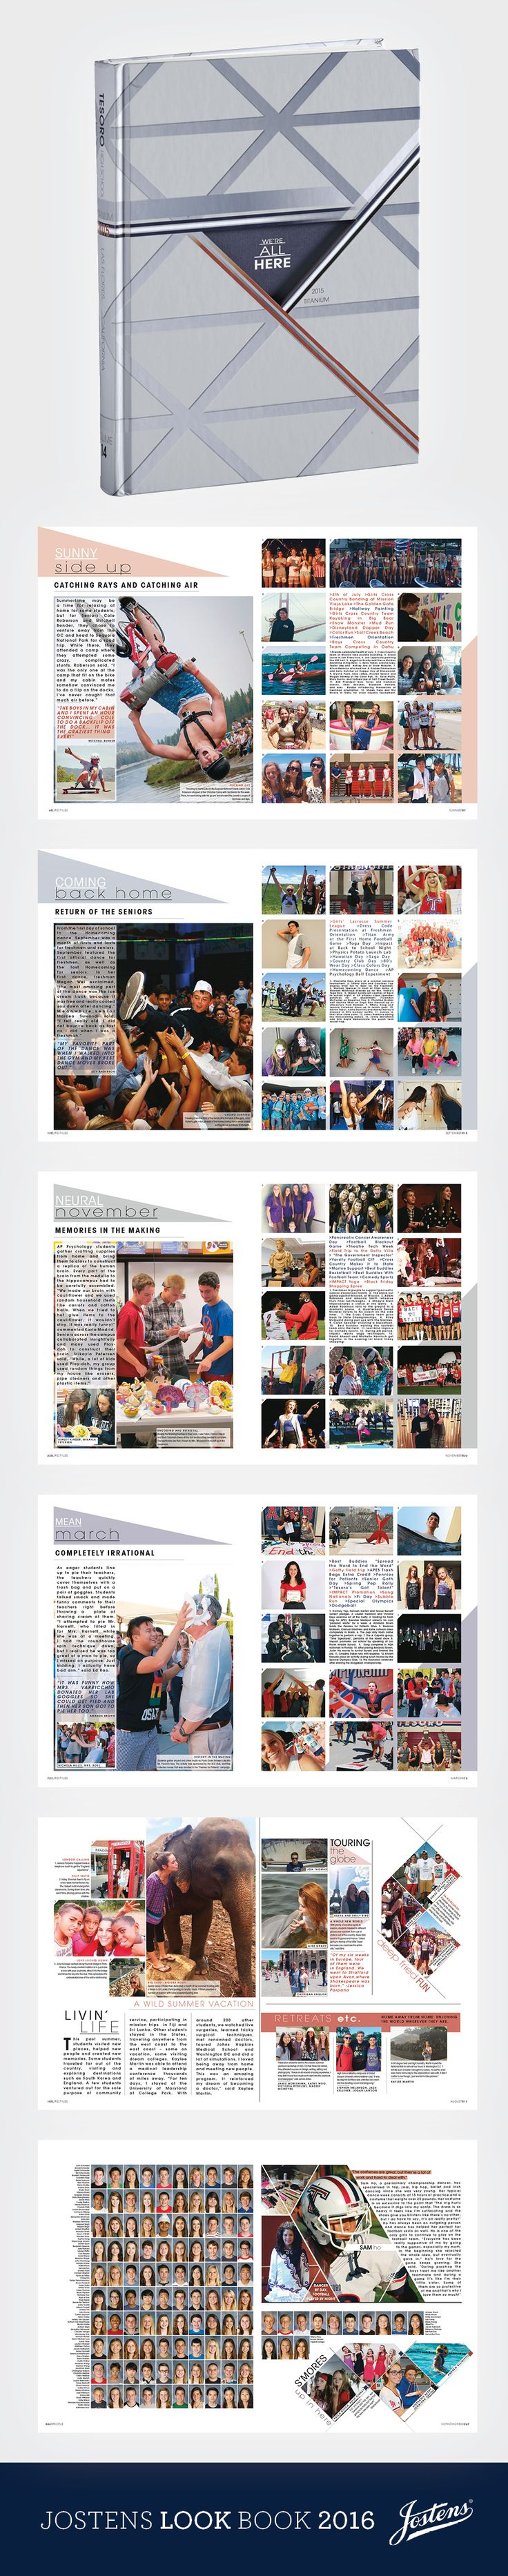 best yearbook images on pinterest yearbook design yearbook